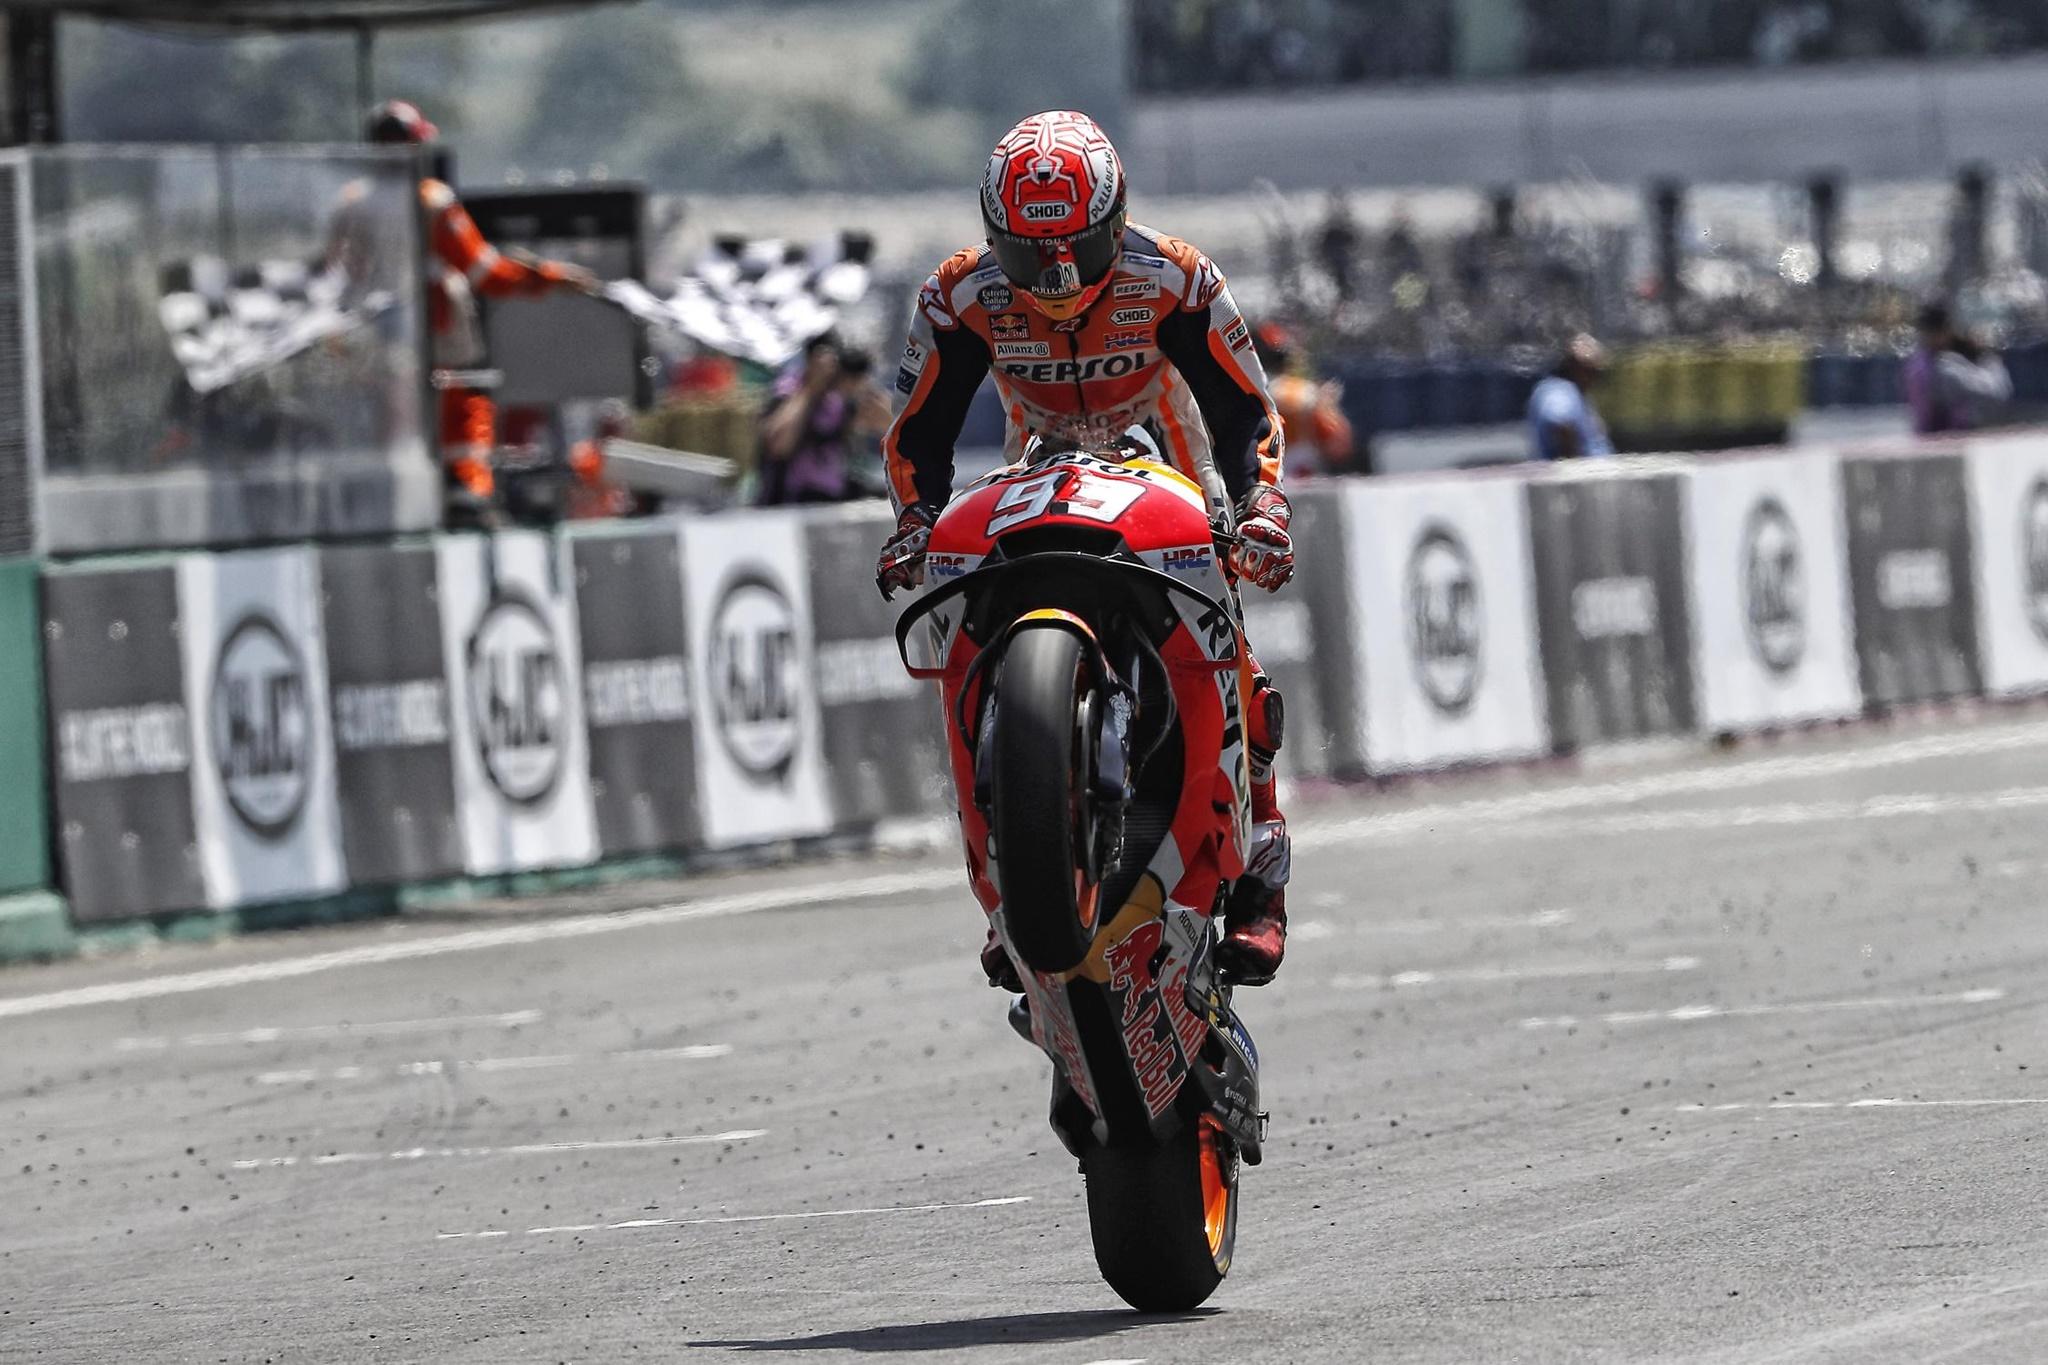 Moto_GP_18_Le_Mans_2018_Xe_Tinhte-007.jpg